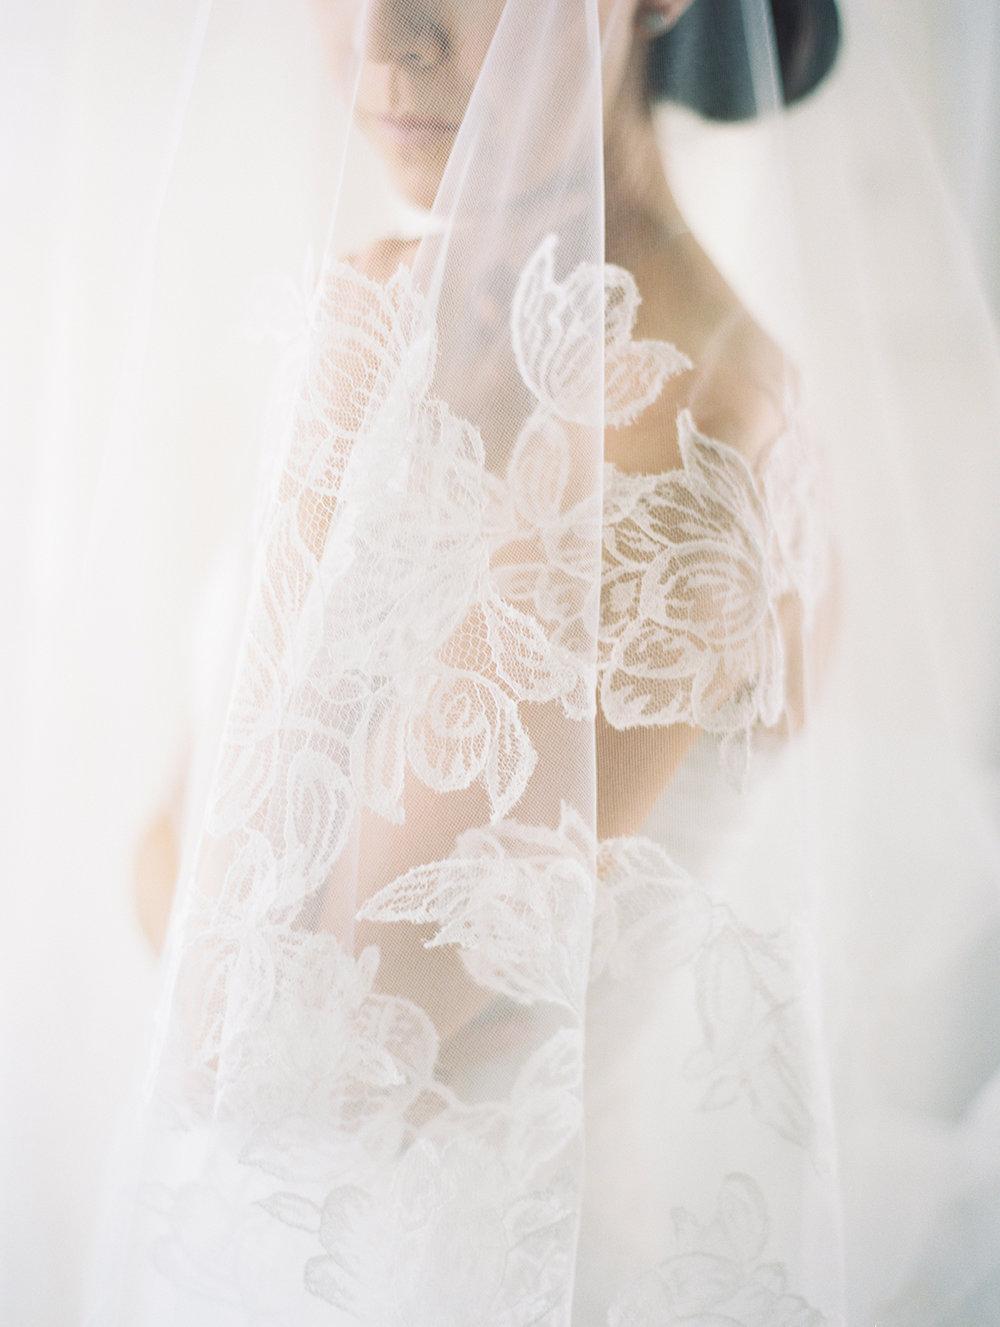 063-brumley-wells-film-photography-destination-wedding-matt-monica.jpg